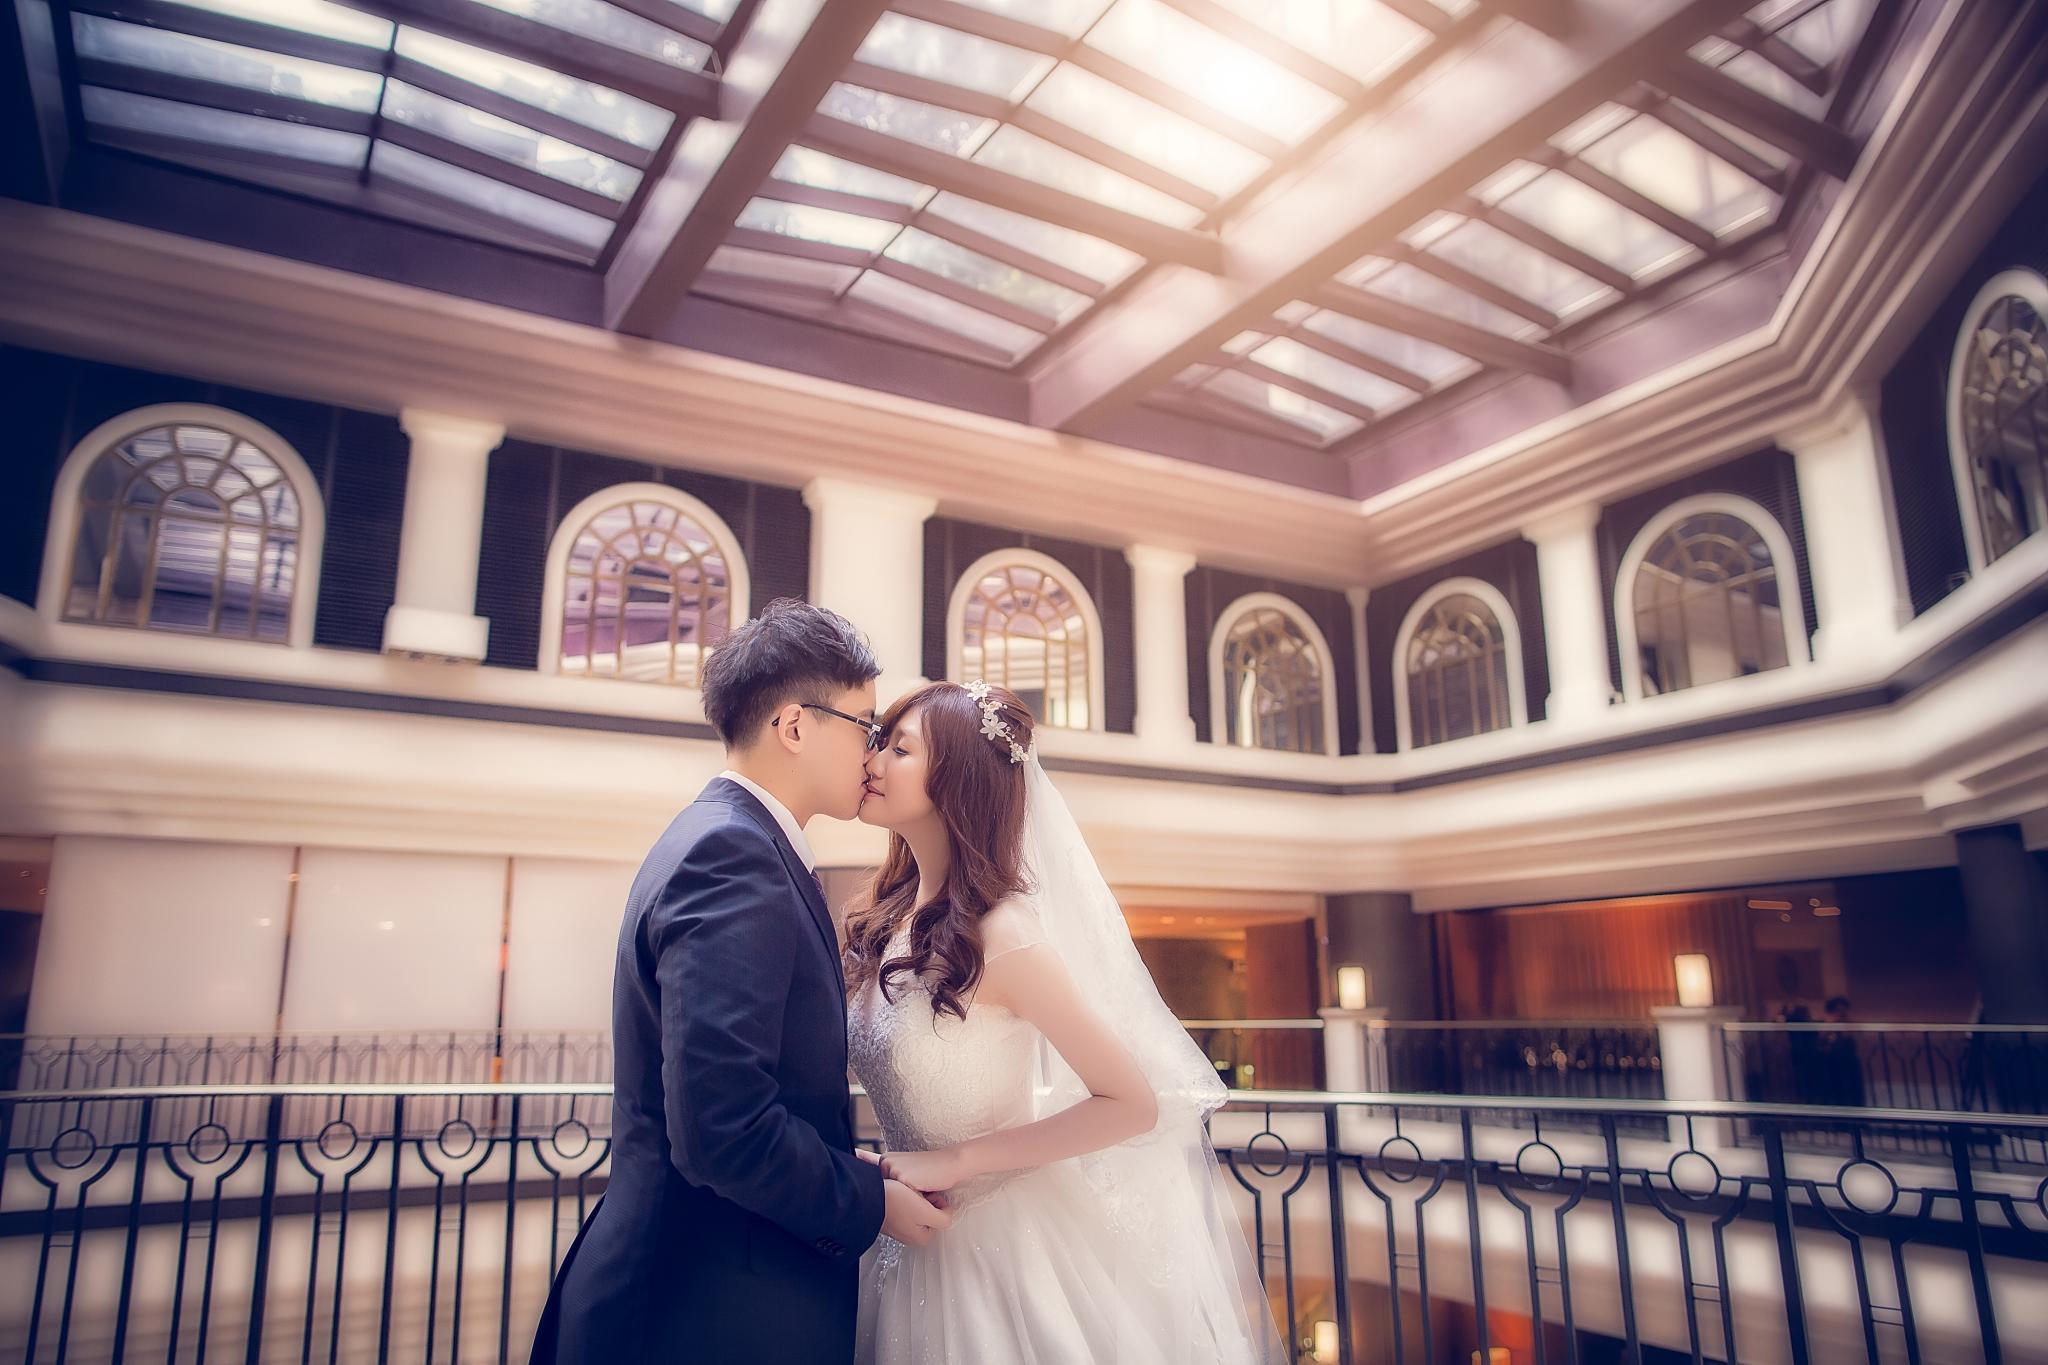 003-wedding